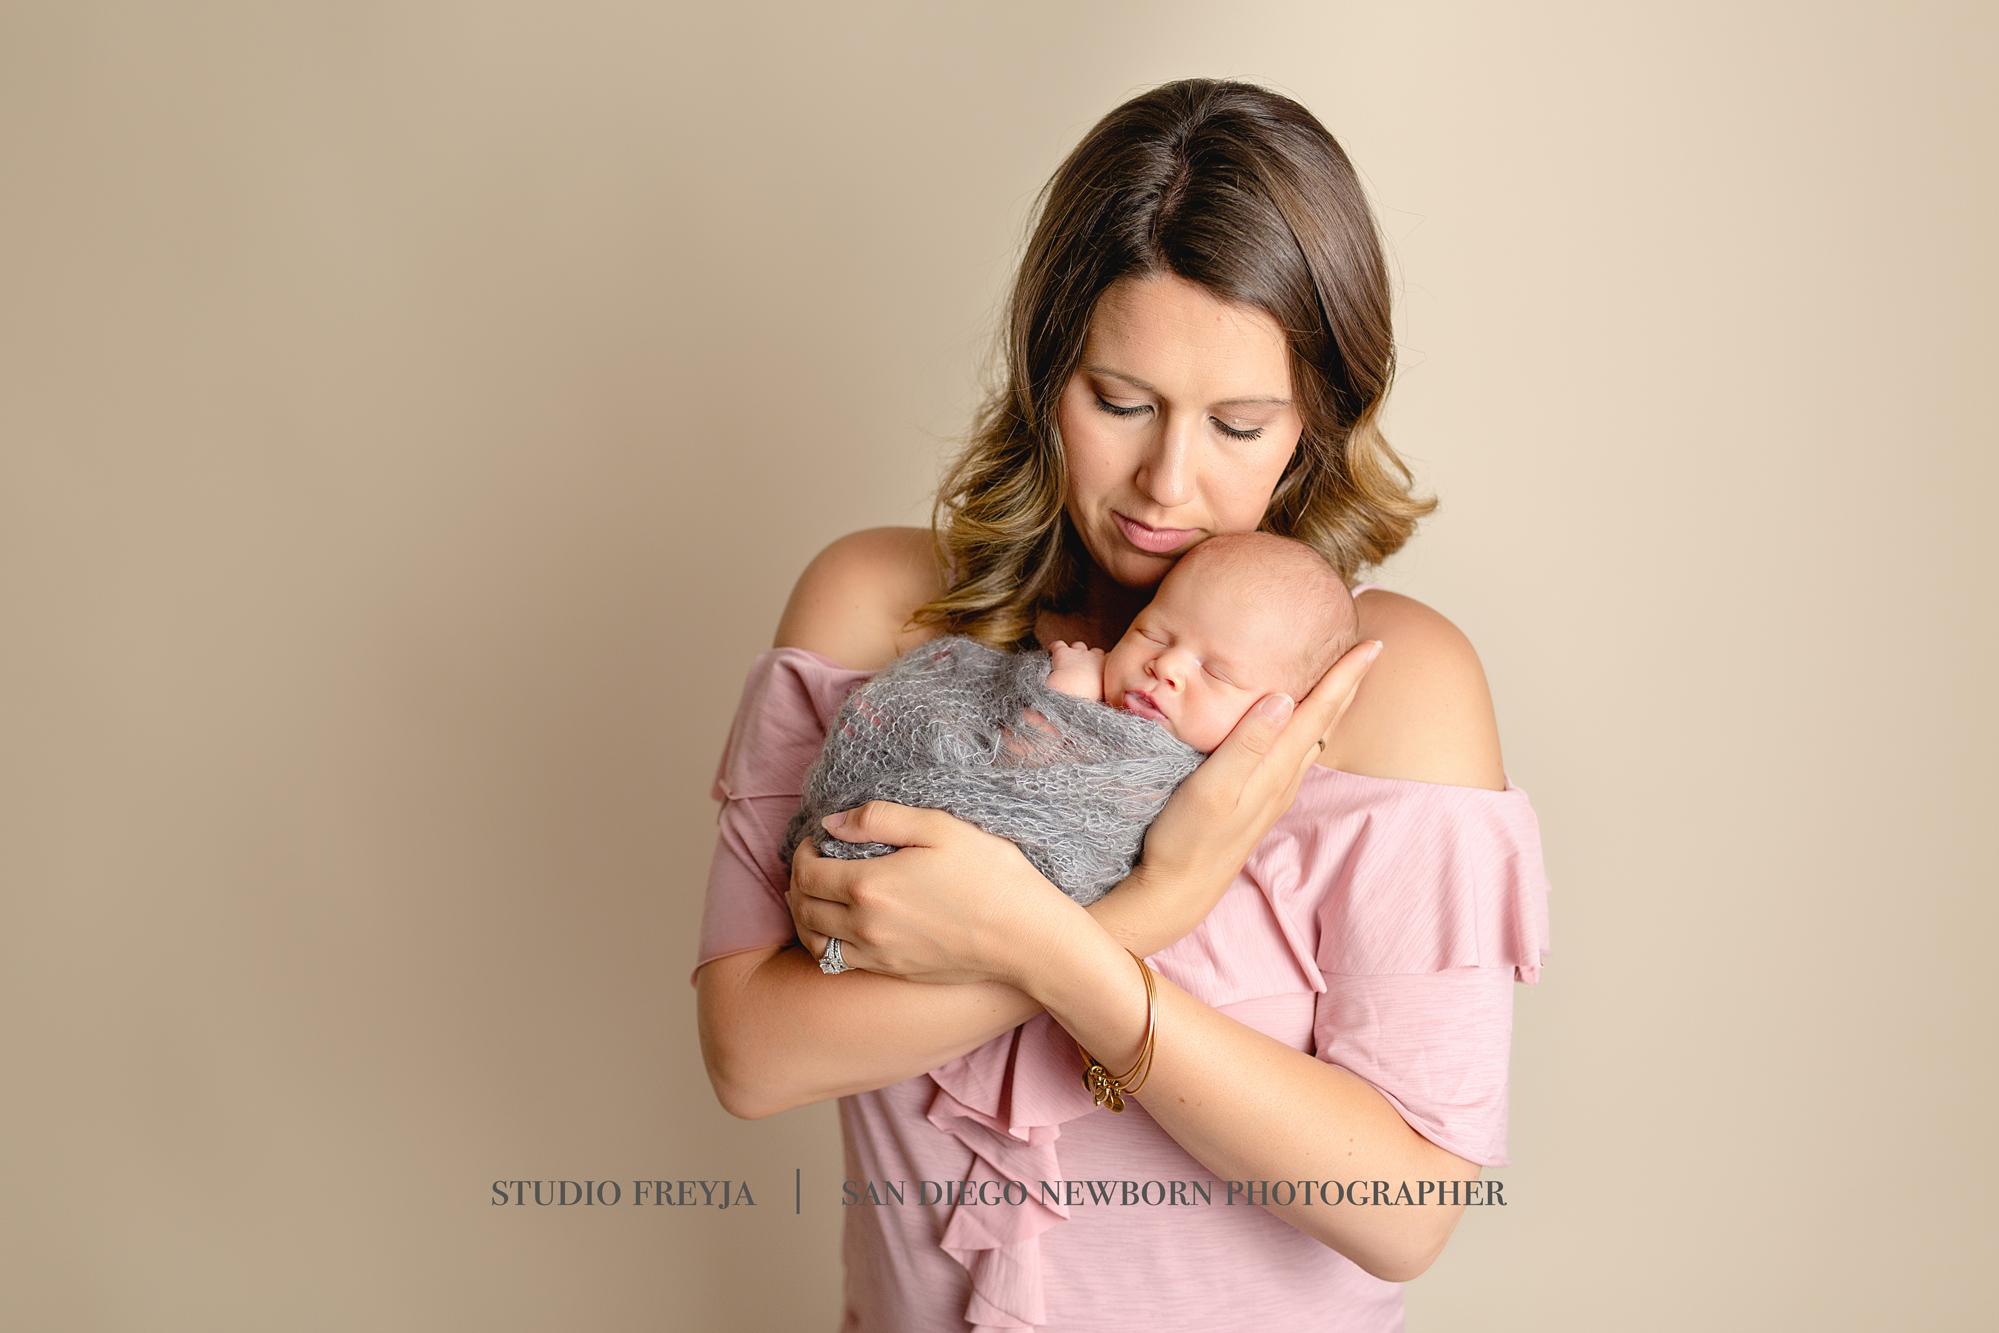 Logan Newborn Pictures Copyright Studio Freyja (4 of 7).jpg